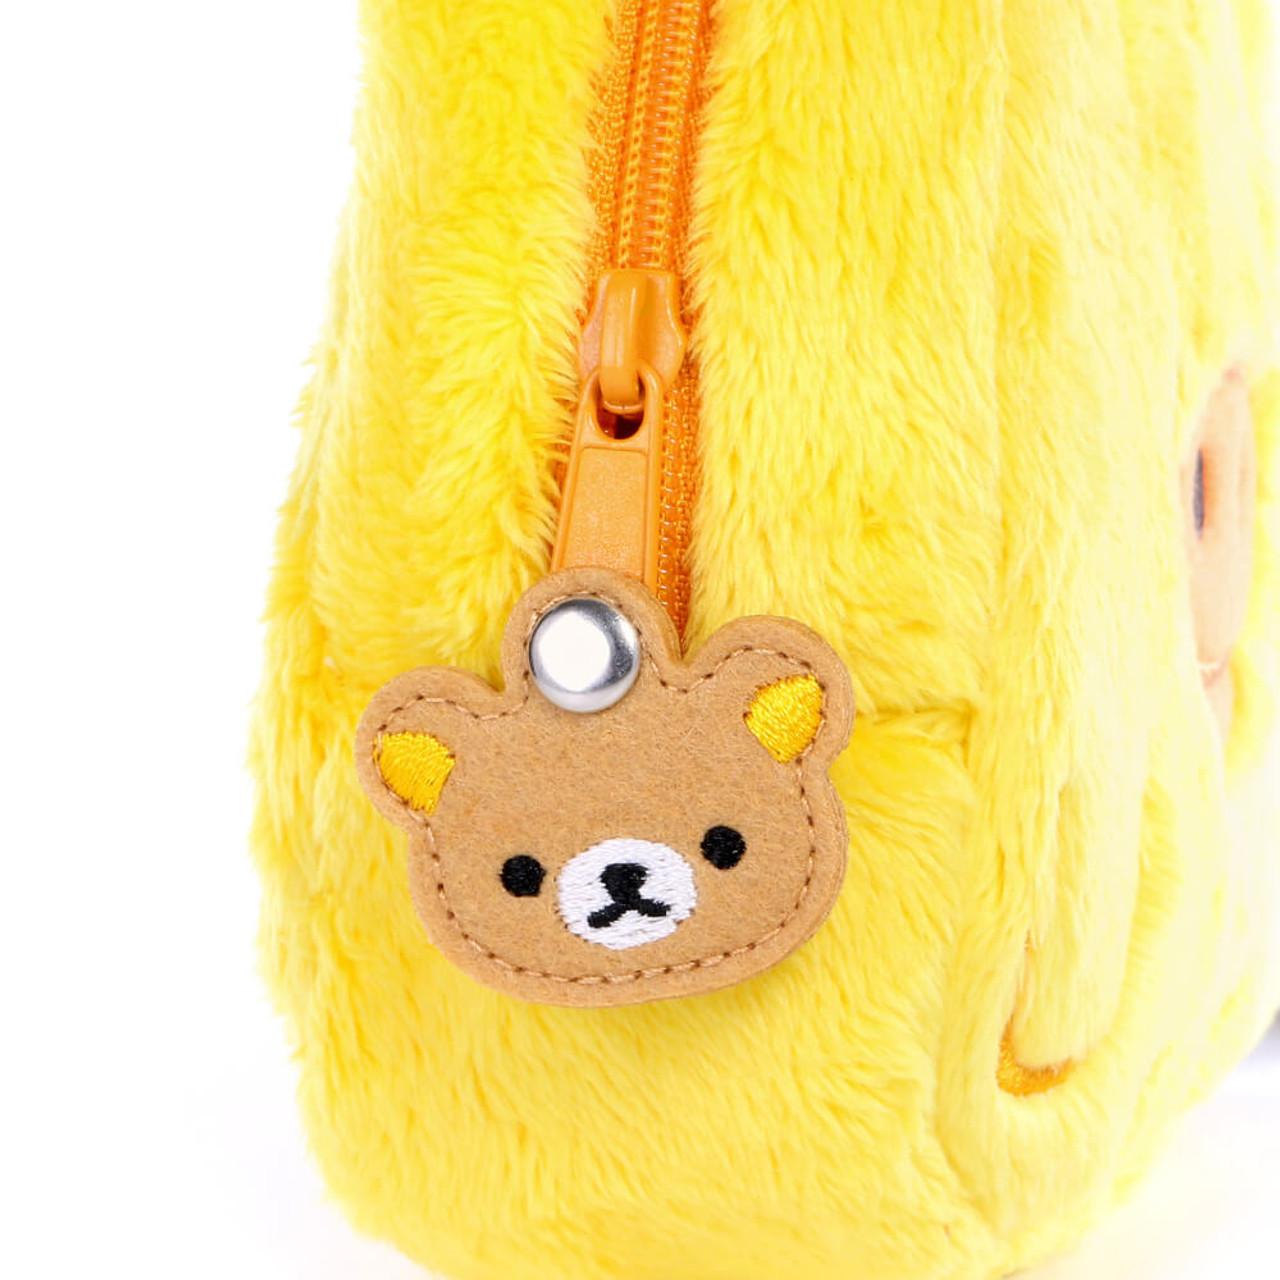 San-x Kiiroitori Yellow Chick Rectangle Face Plush Cosmetic Pouch ( Feature 01 )